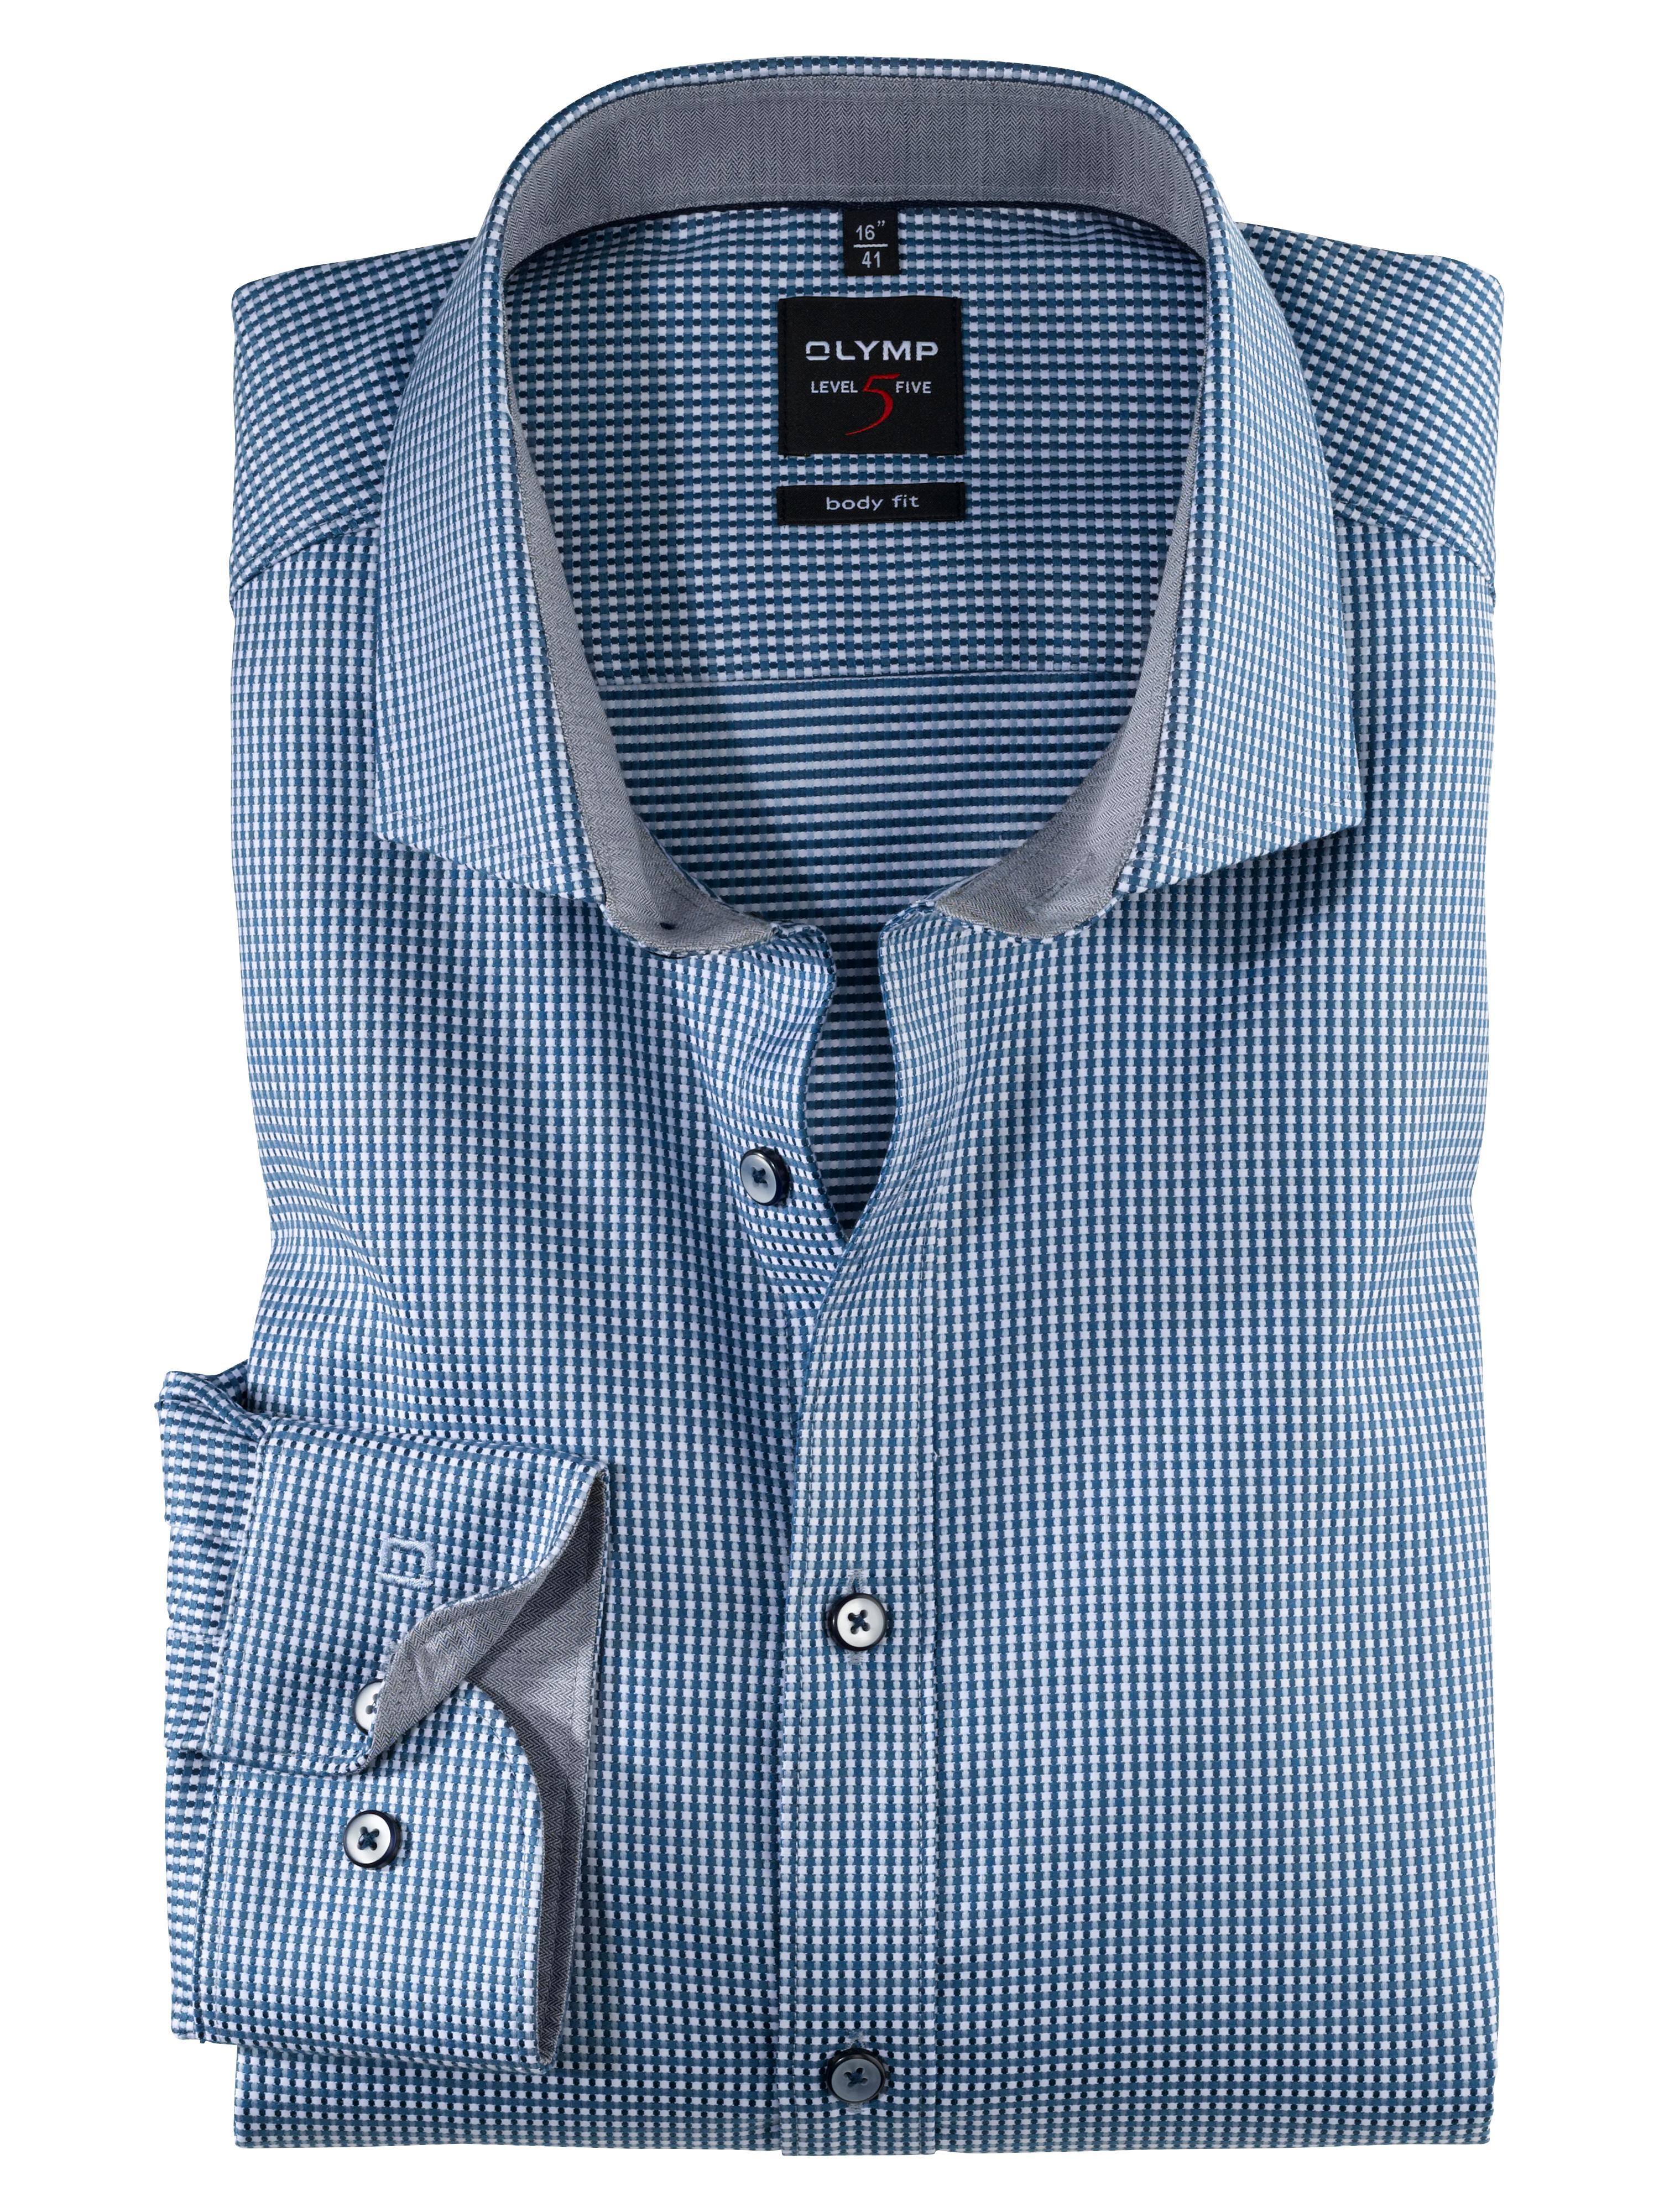 OLYMP Level Five Hemd, body fit, Royal Kent, Rauchblau, 43   Bekleidung > Hemden > Sonstige Hemden   Baumwolle   OLYMP